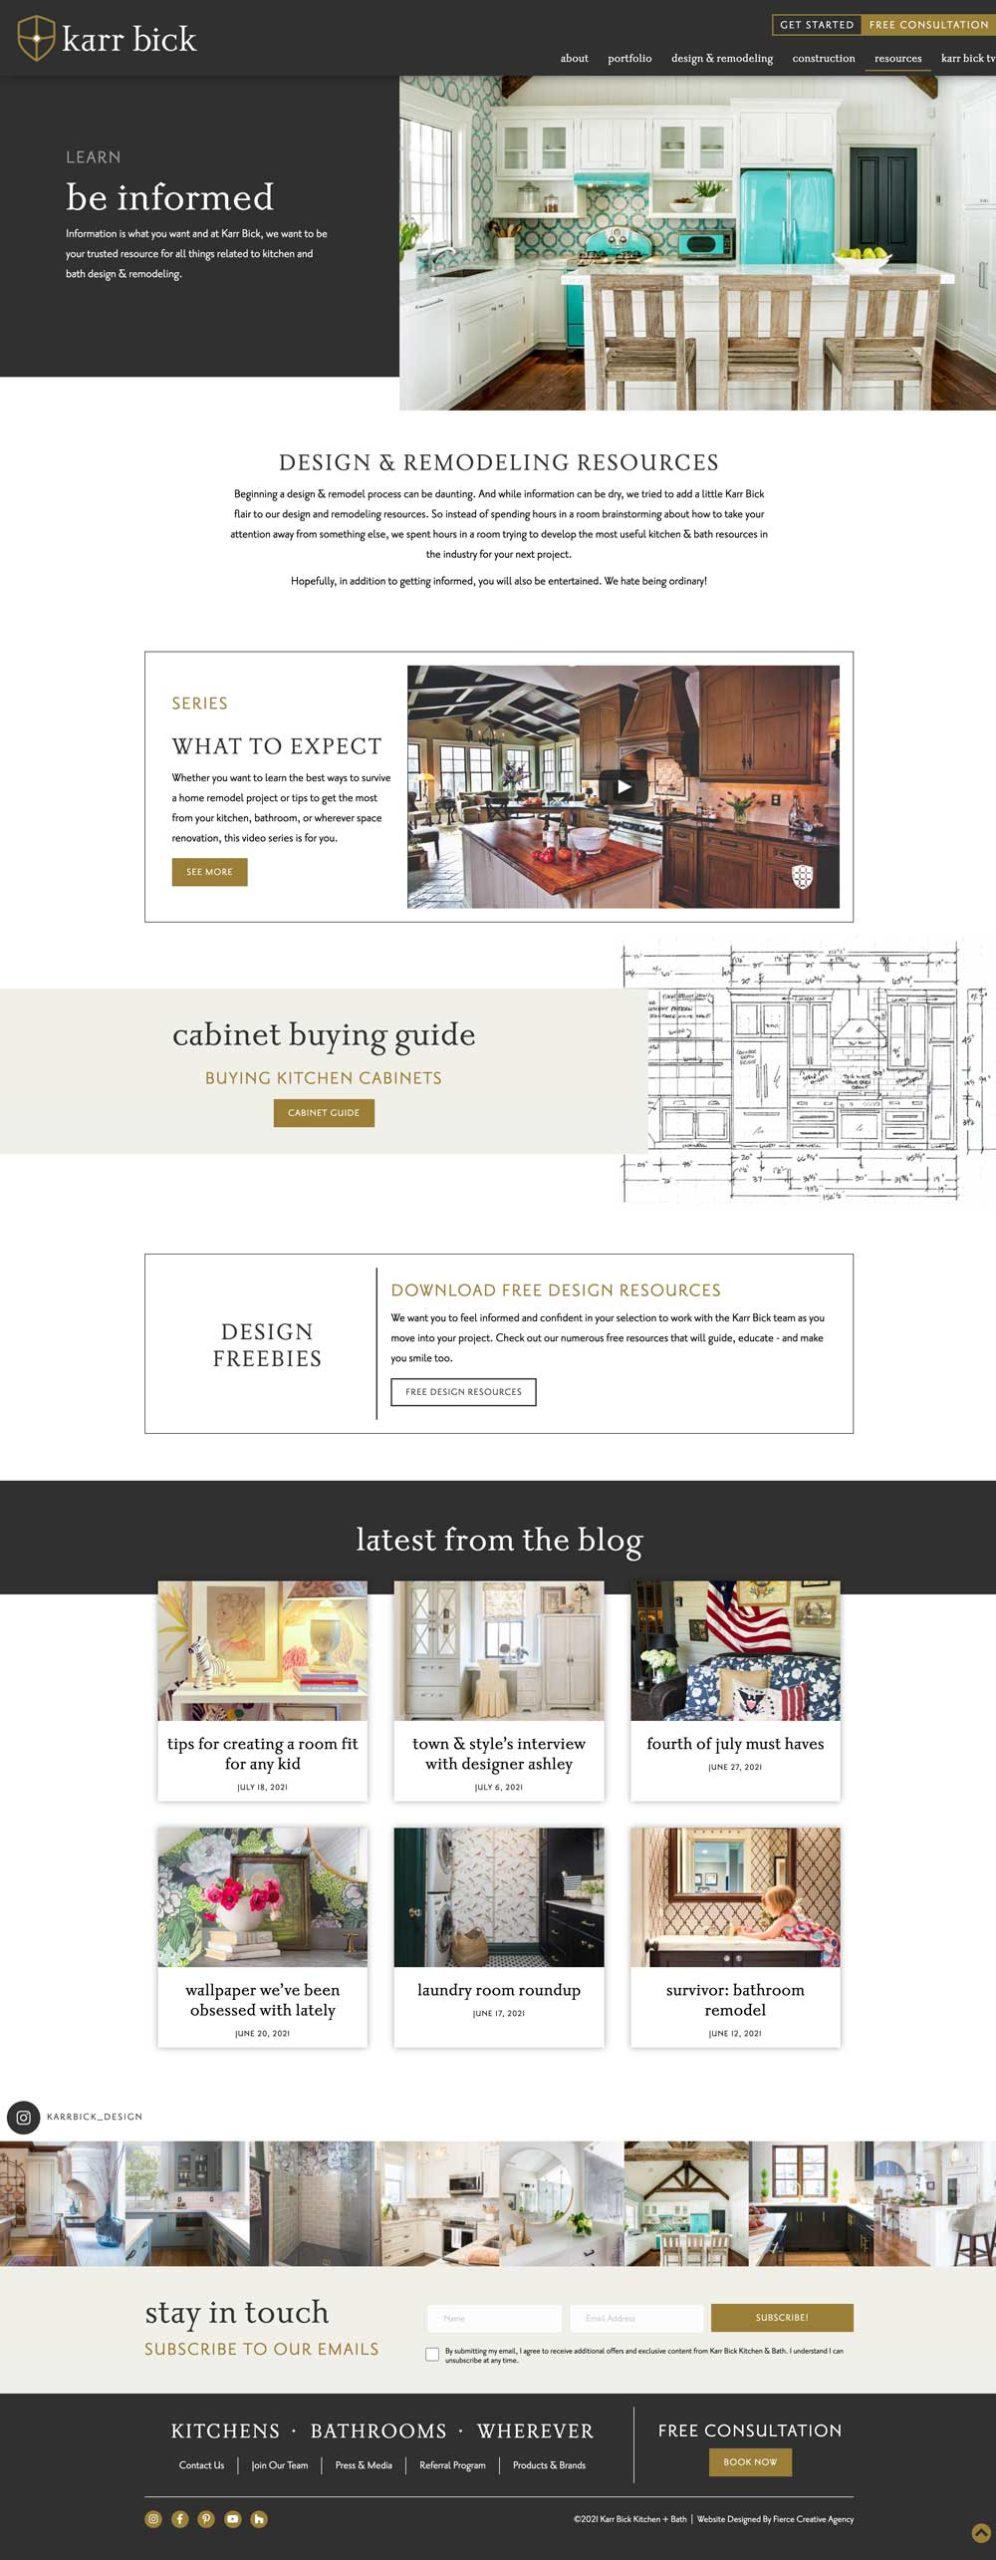 Karr Bick Website Design - Resources